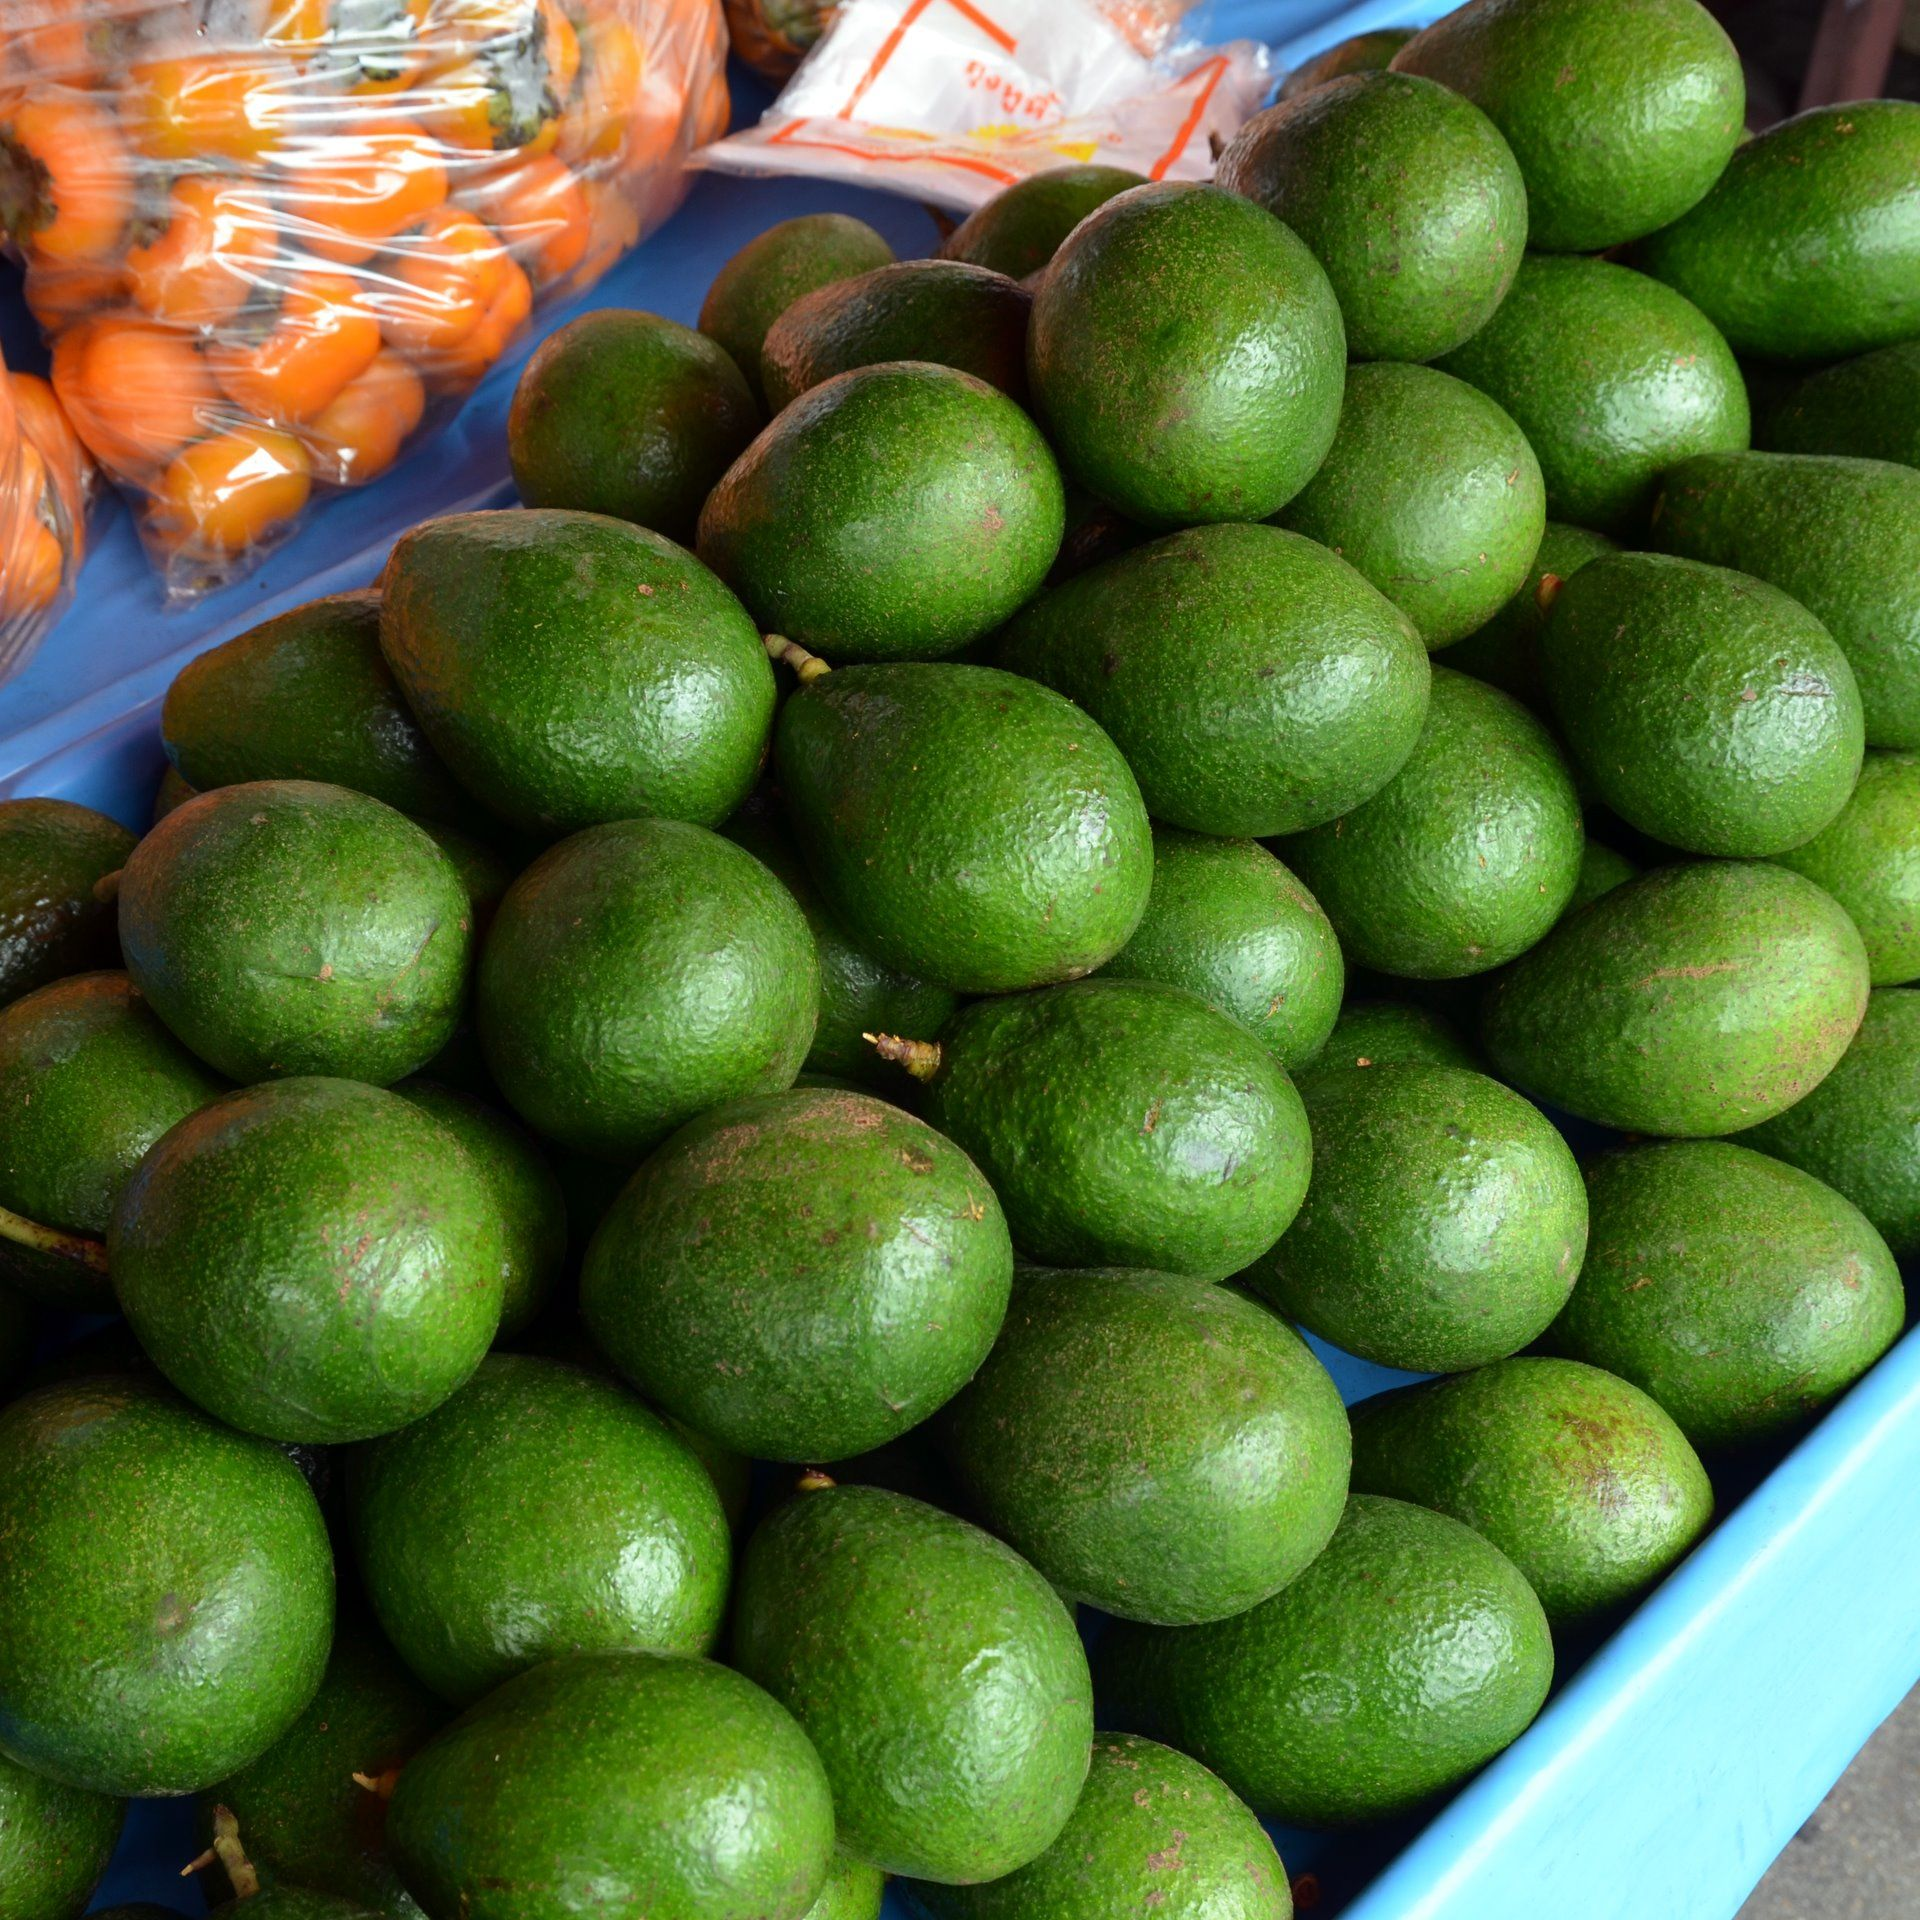 Avocado's are beautiful and creamy on Norfolk Island